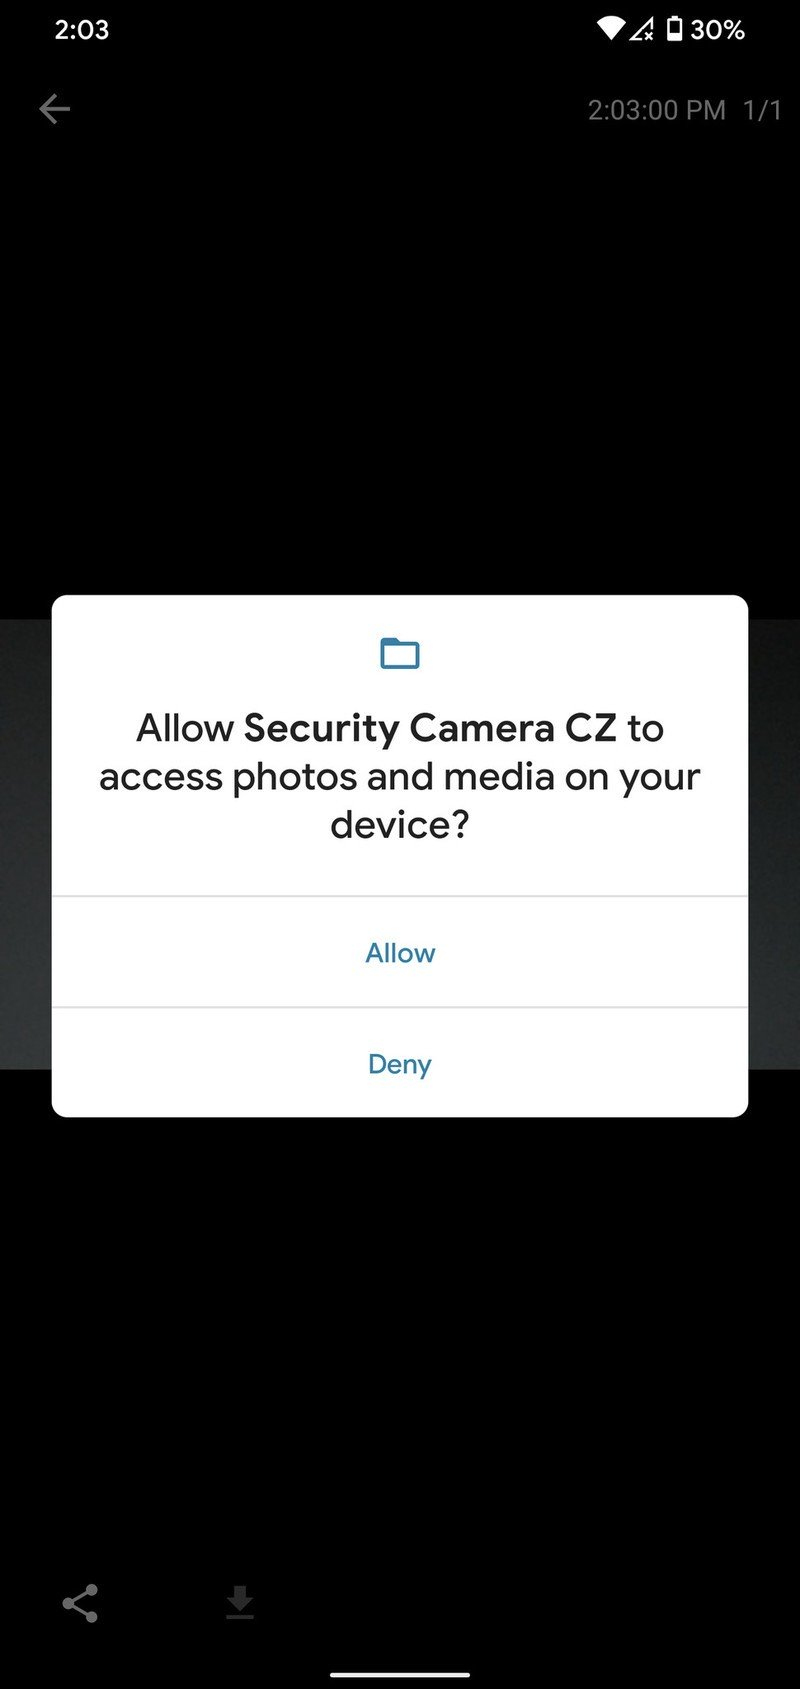 security-camera-cz-viewer-4.jpg?itok=BPB